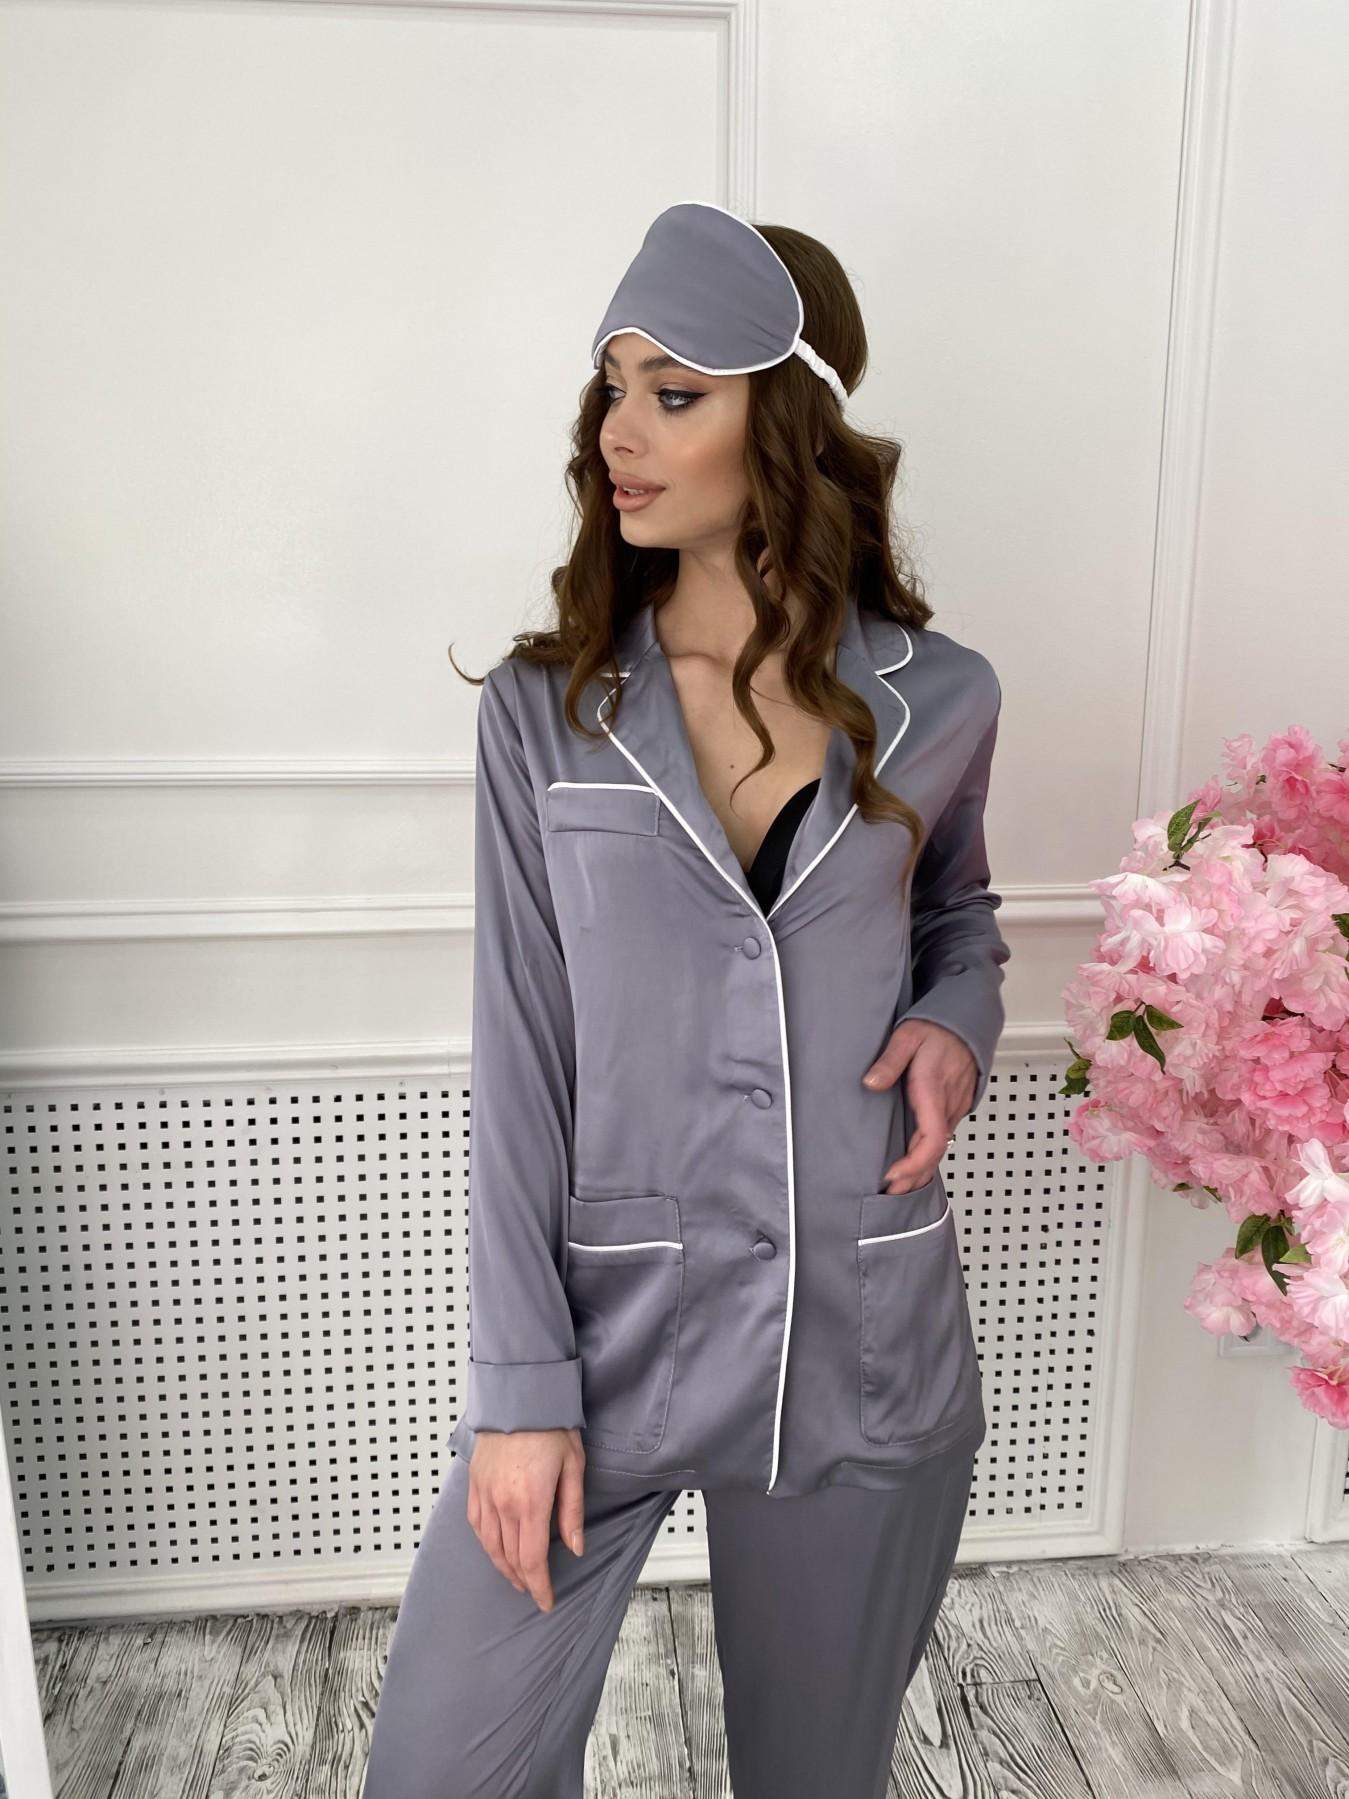 Шайн костюм из шелка  10778 АРТ. 47218 Цвет: темно серый - фото 6, интернет магазин tm-modus.ru